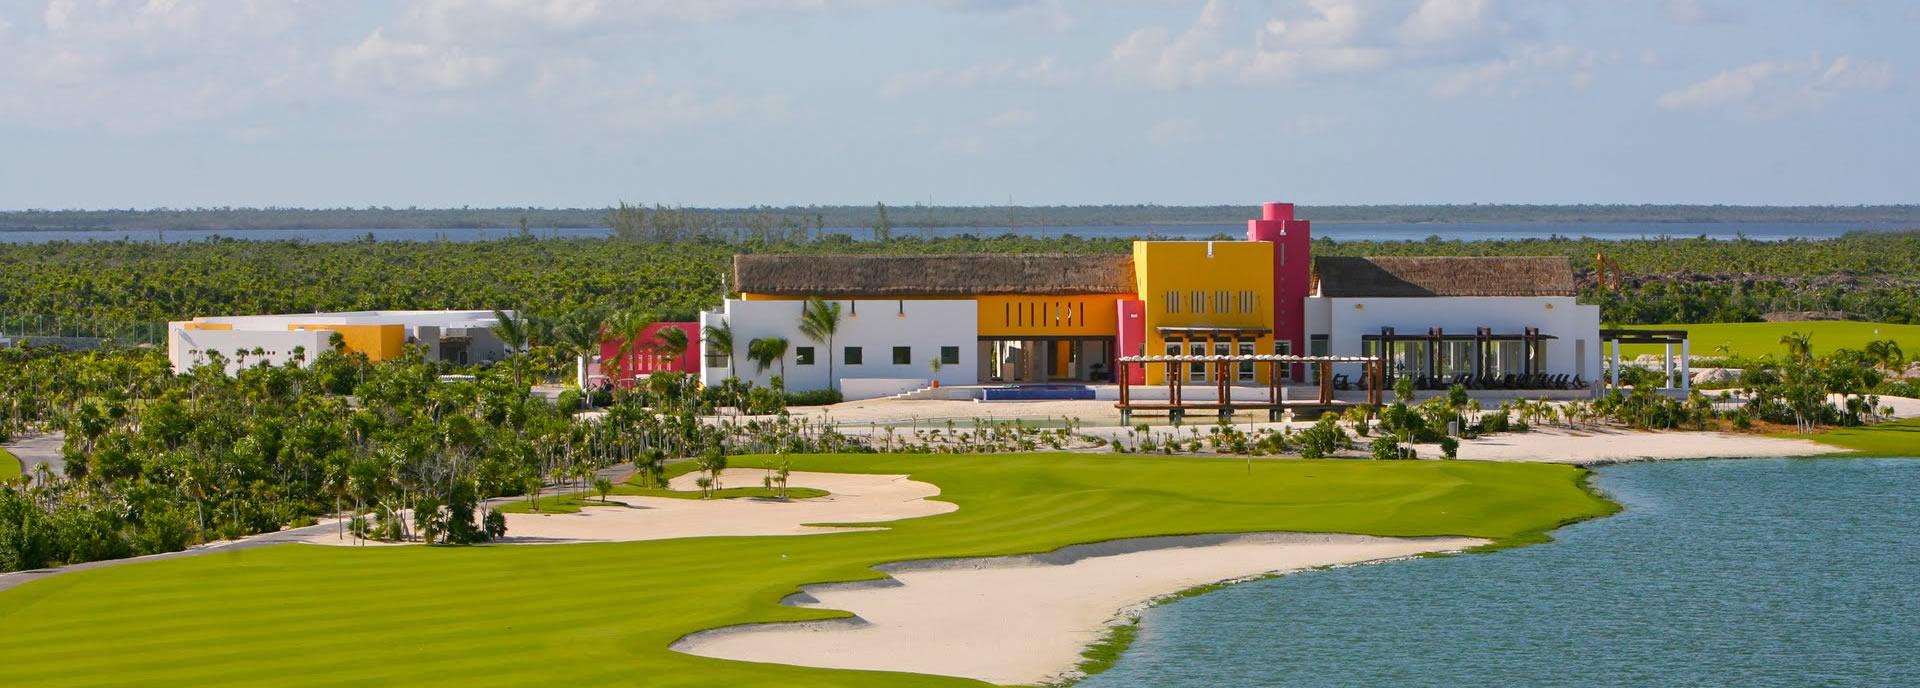 Playa Mujeres Golf Club in Cancun